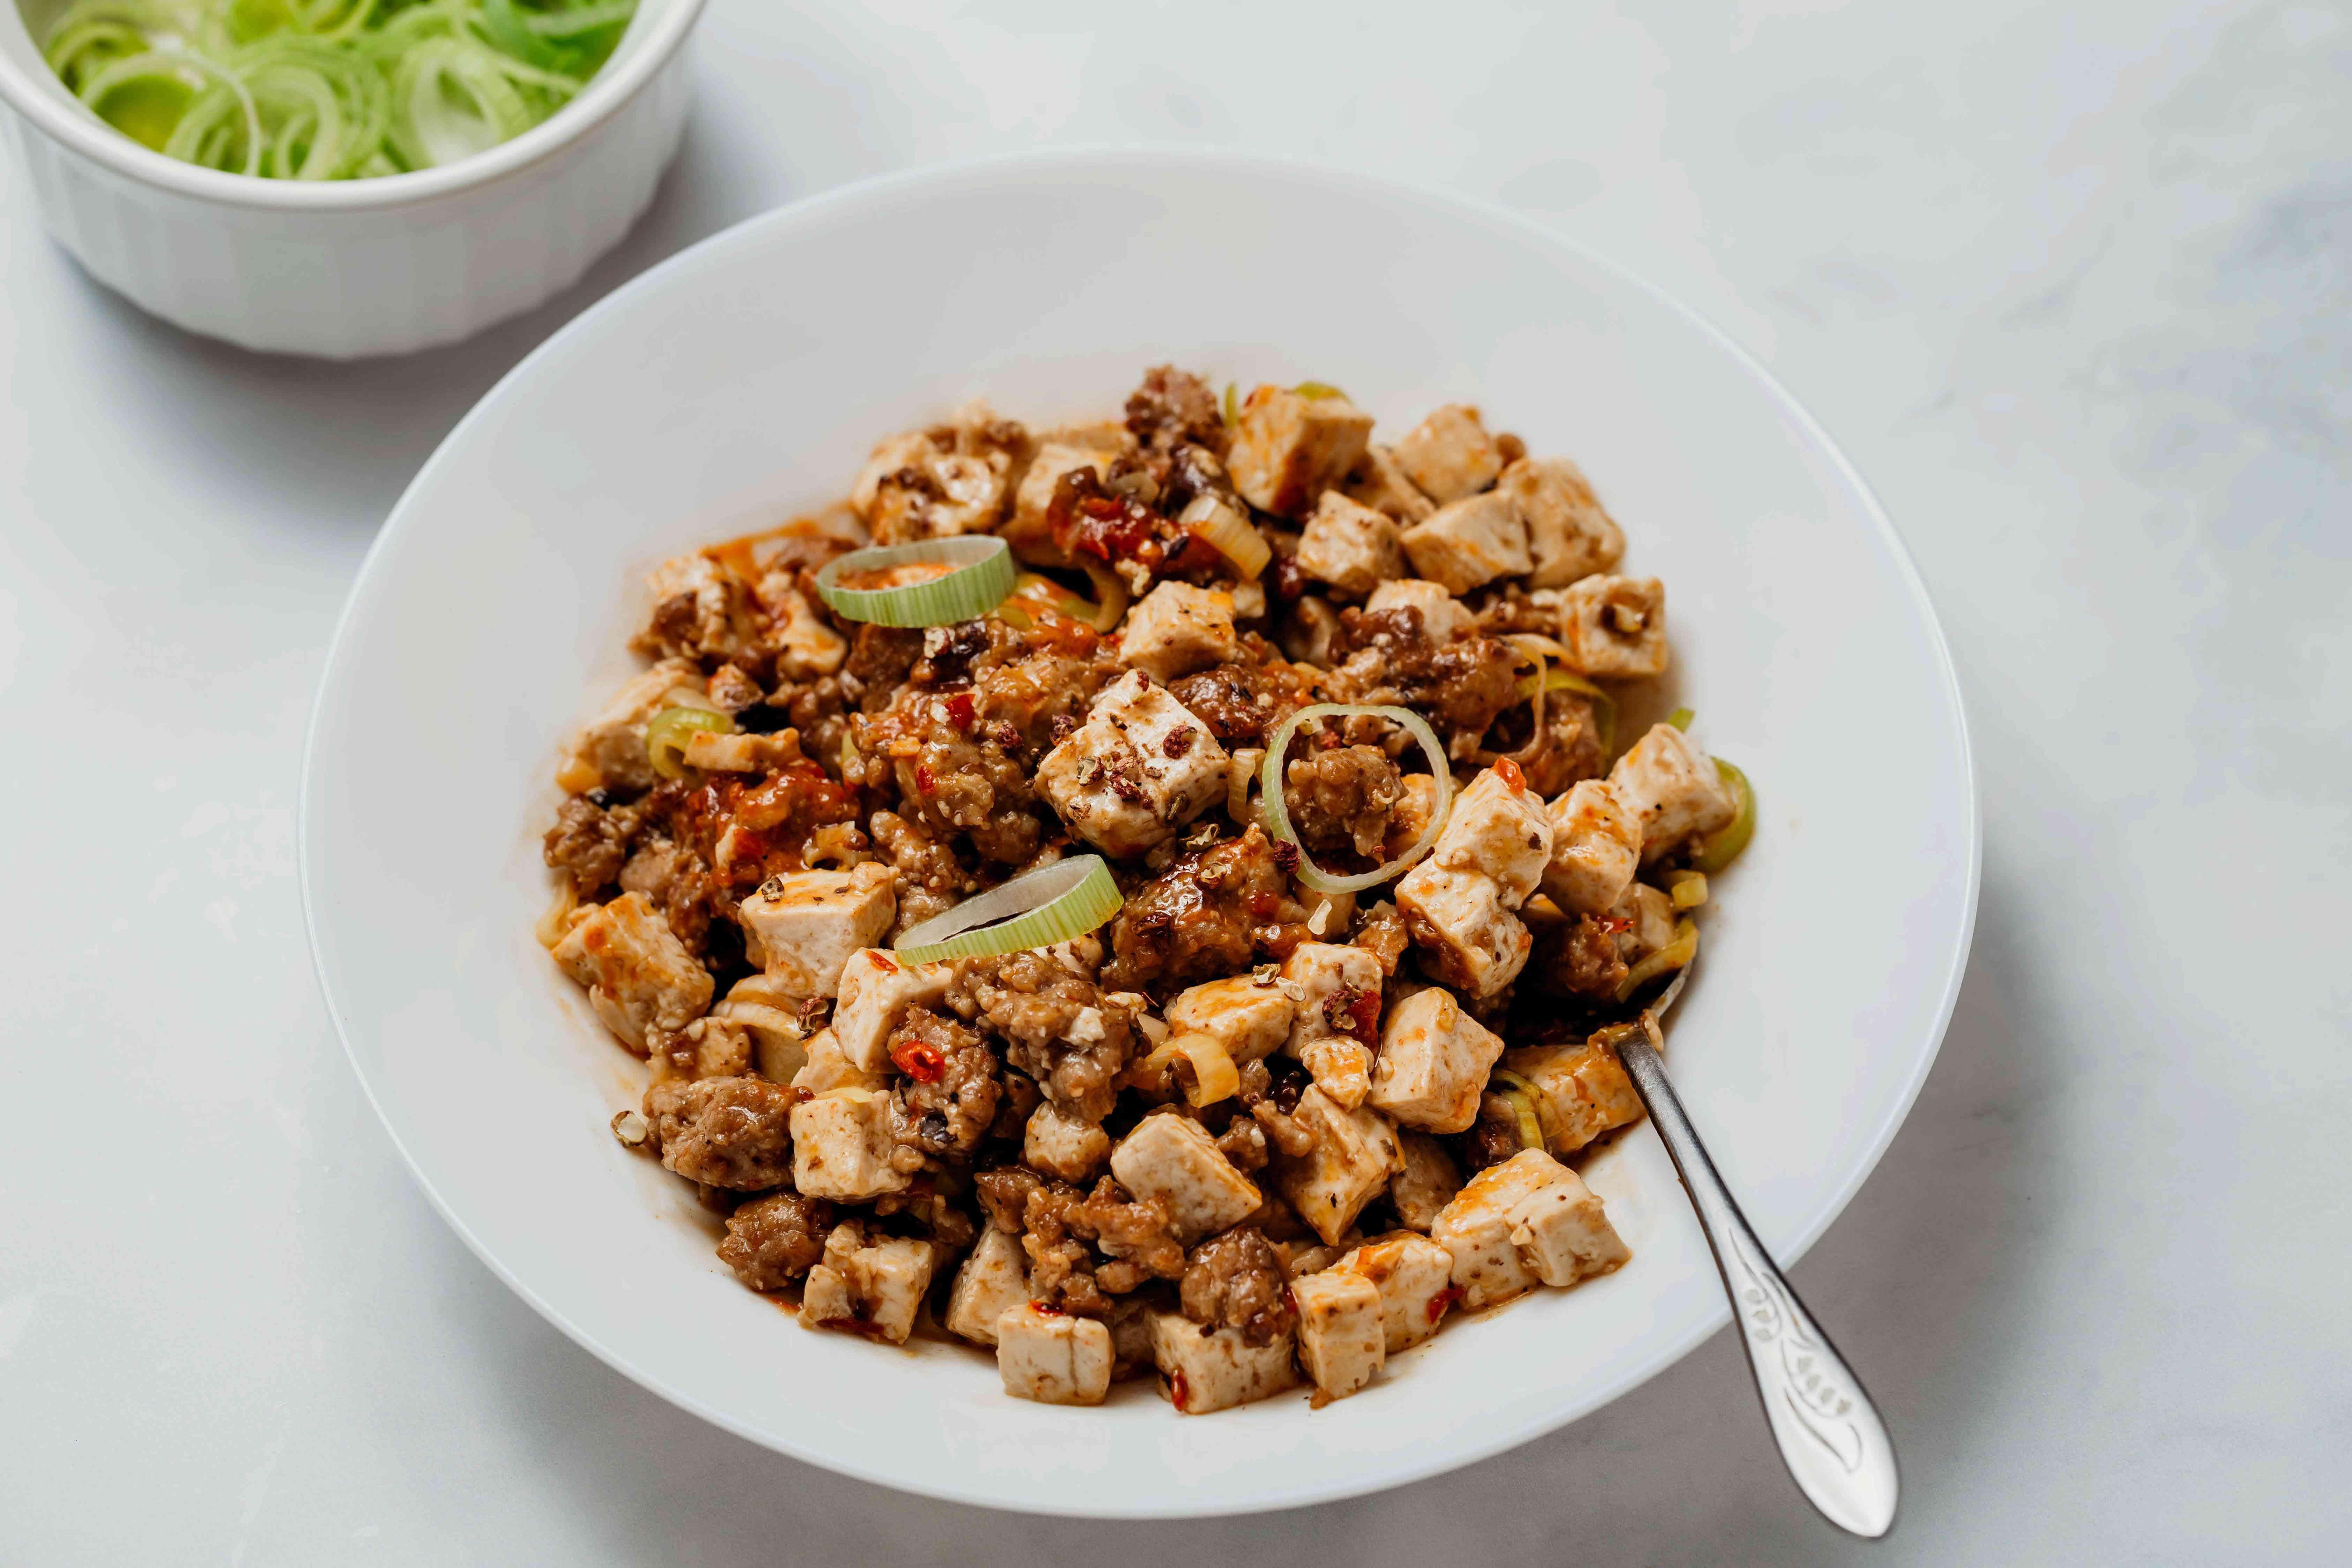 Sichuan Mapo Tofu, serve with freshly ground Szechuan pepper